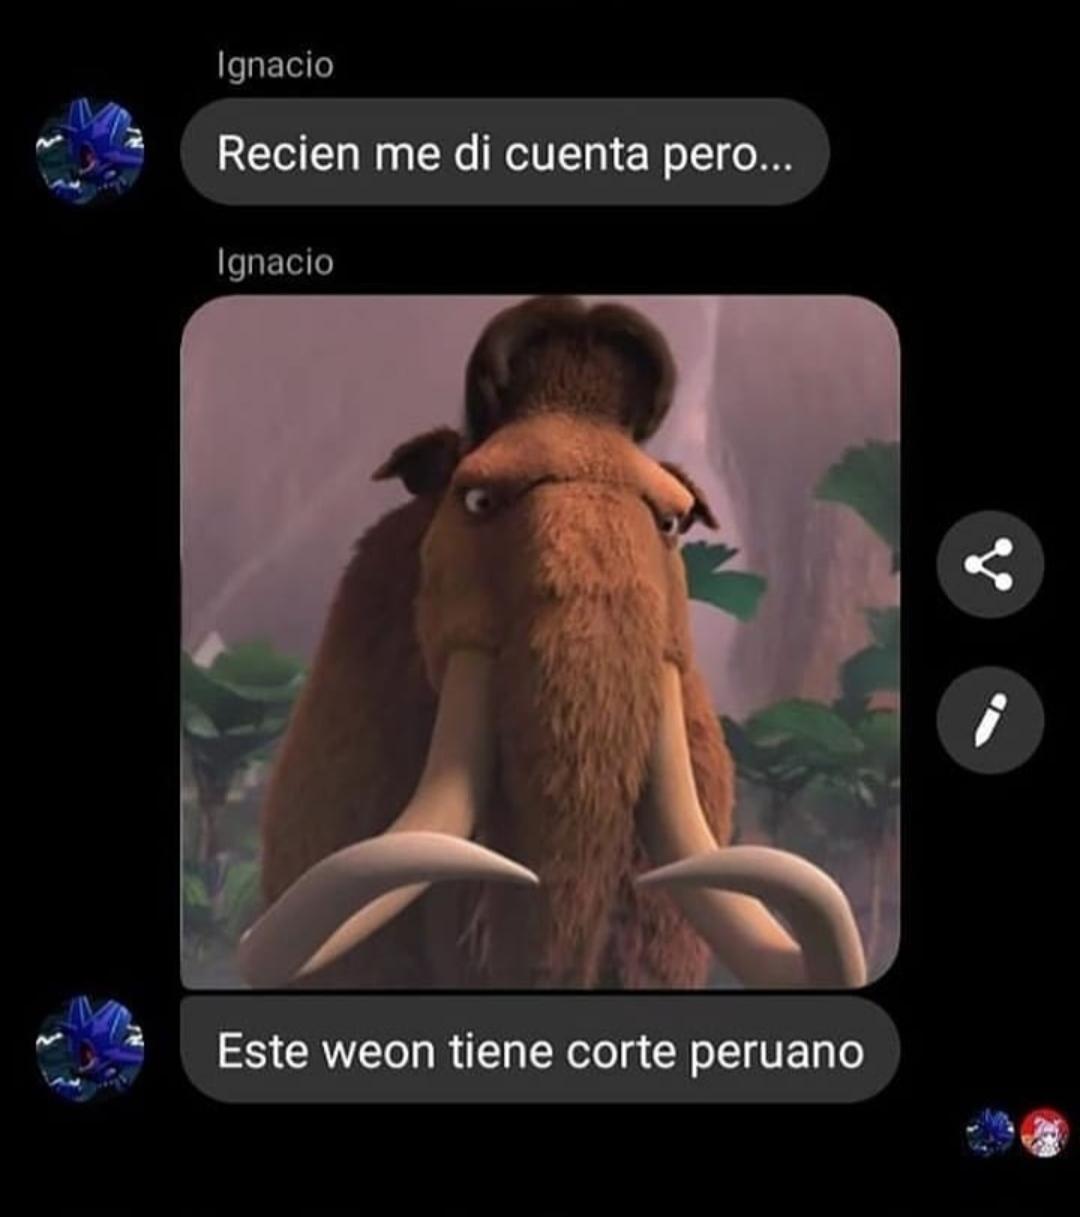 Maní peruano - meme